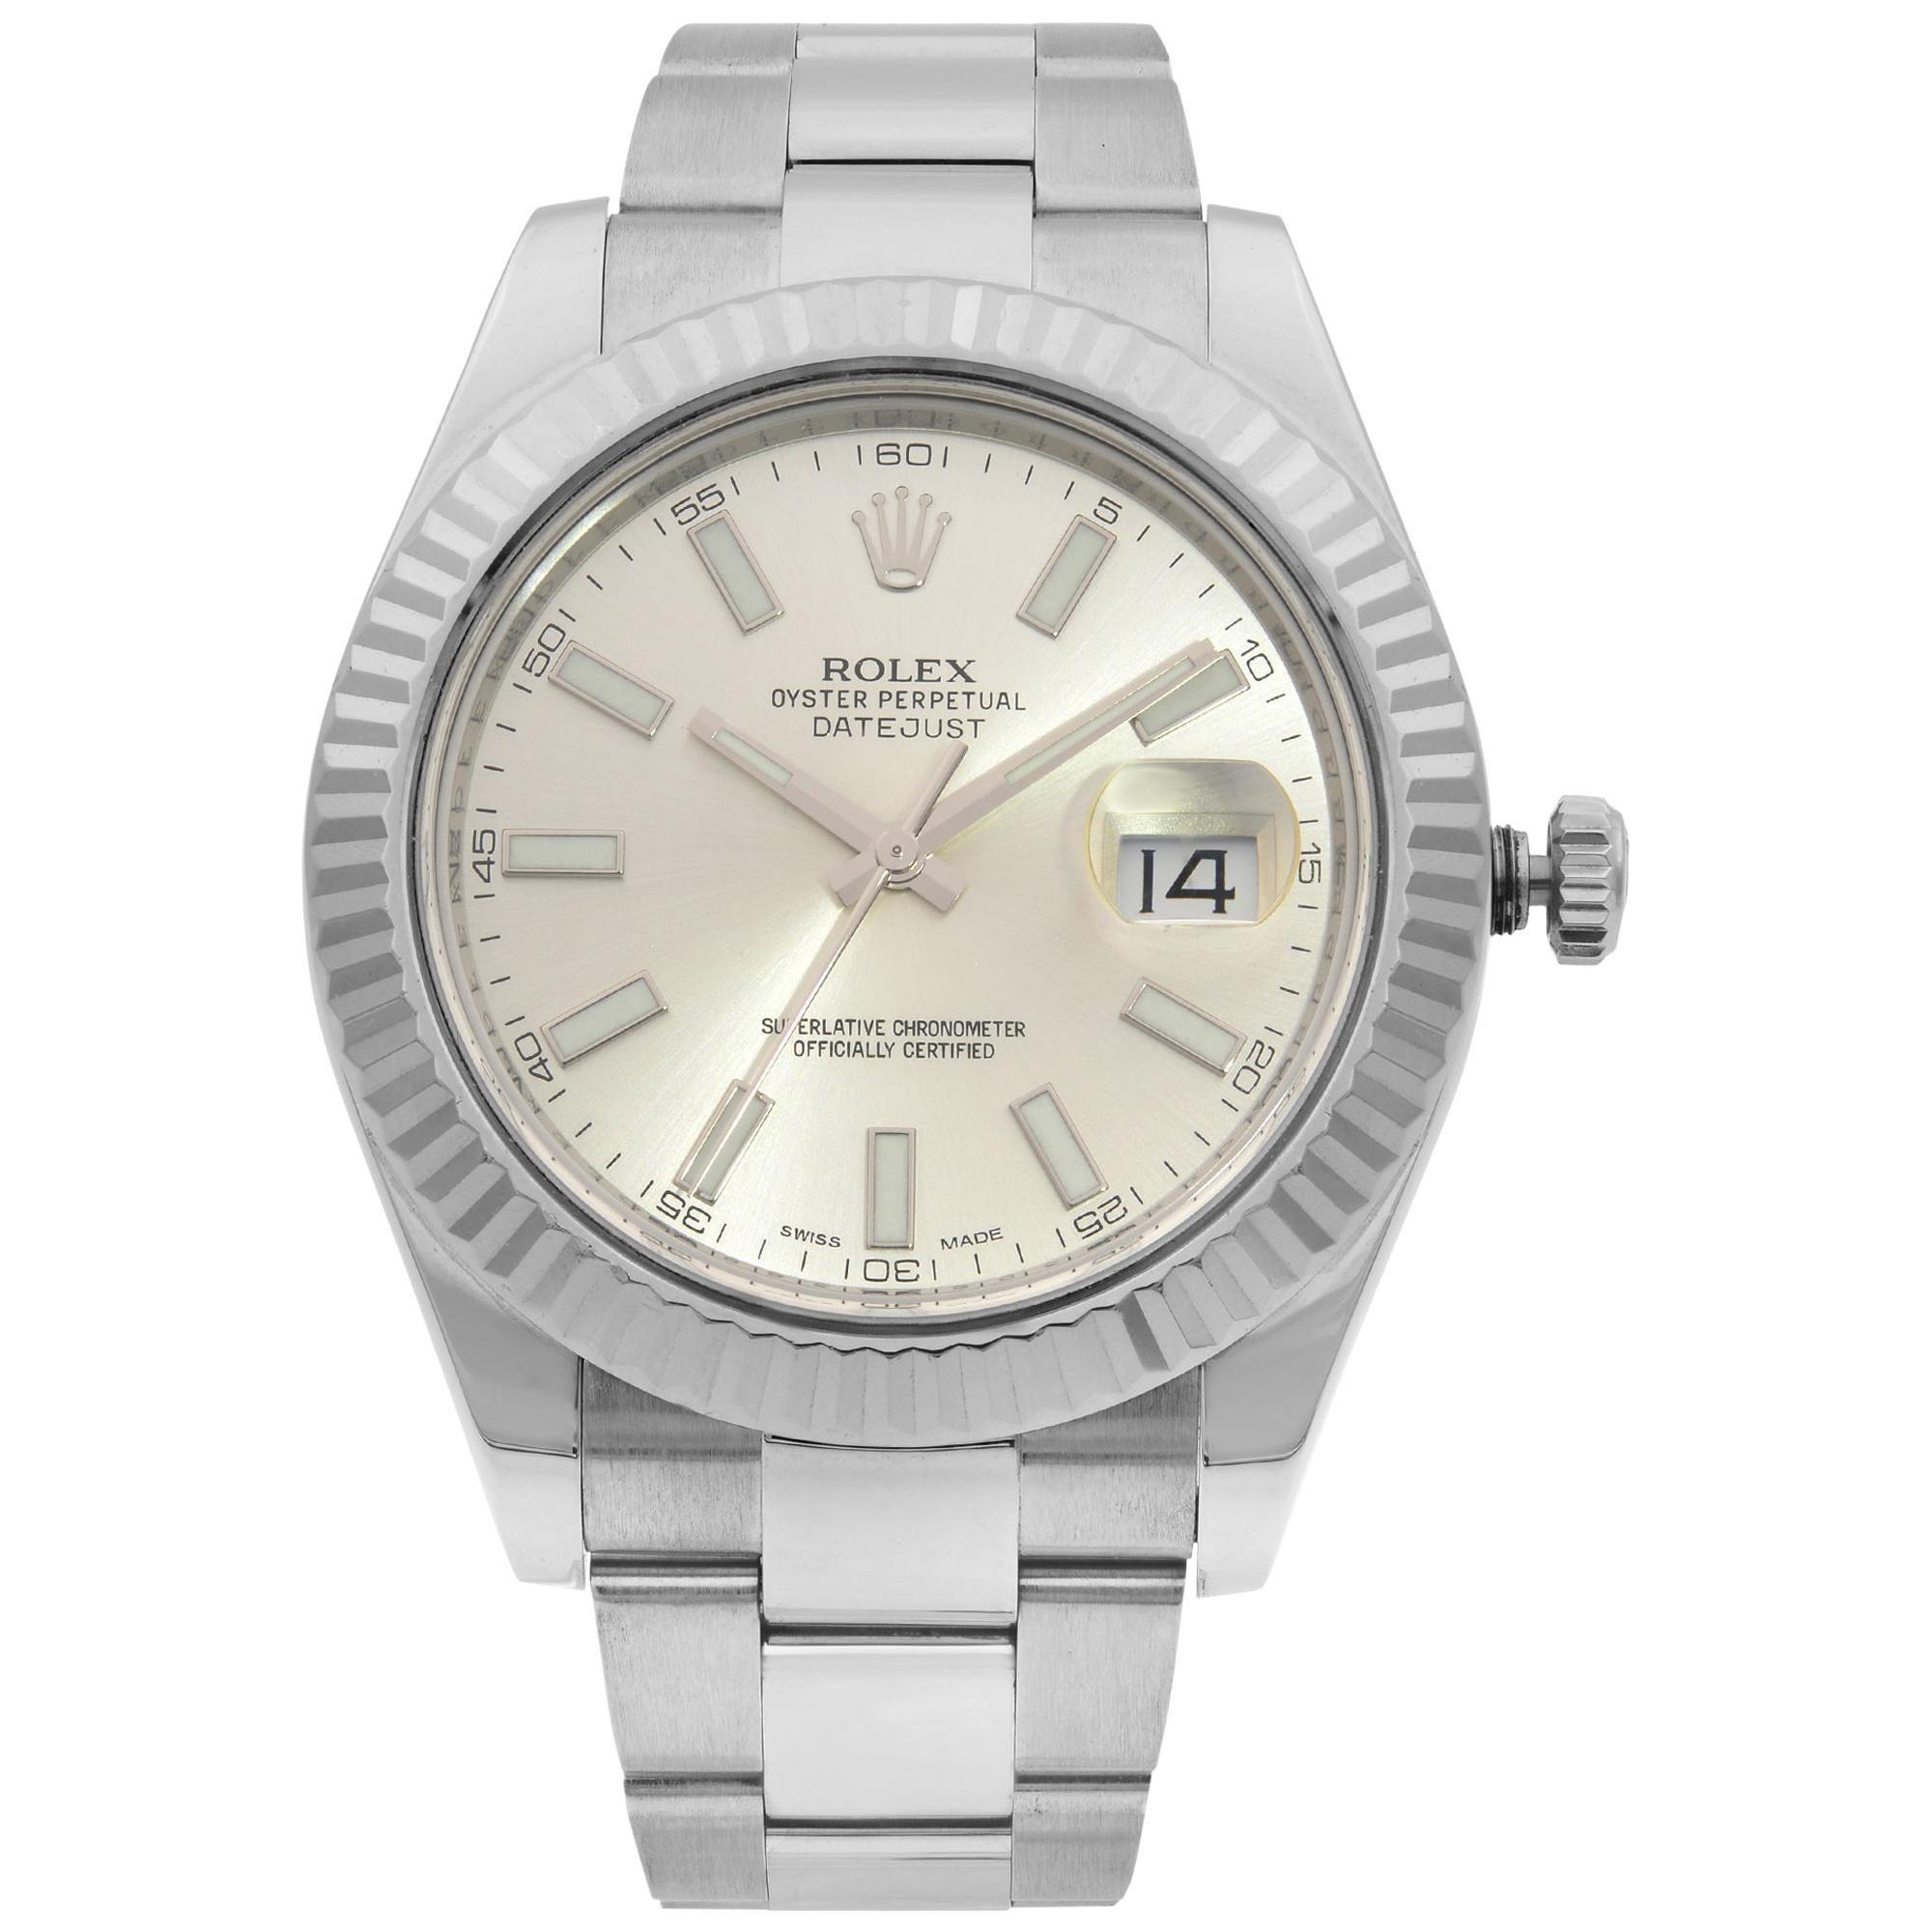 Rolex Datejust II Steel 18 Karat Gold Silver Dial Automatic Men's Watch 116334